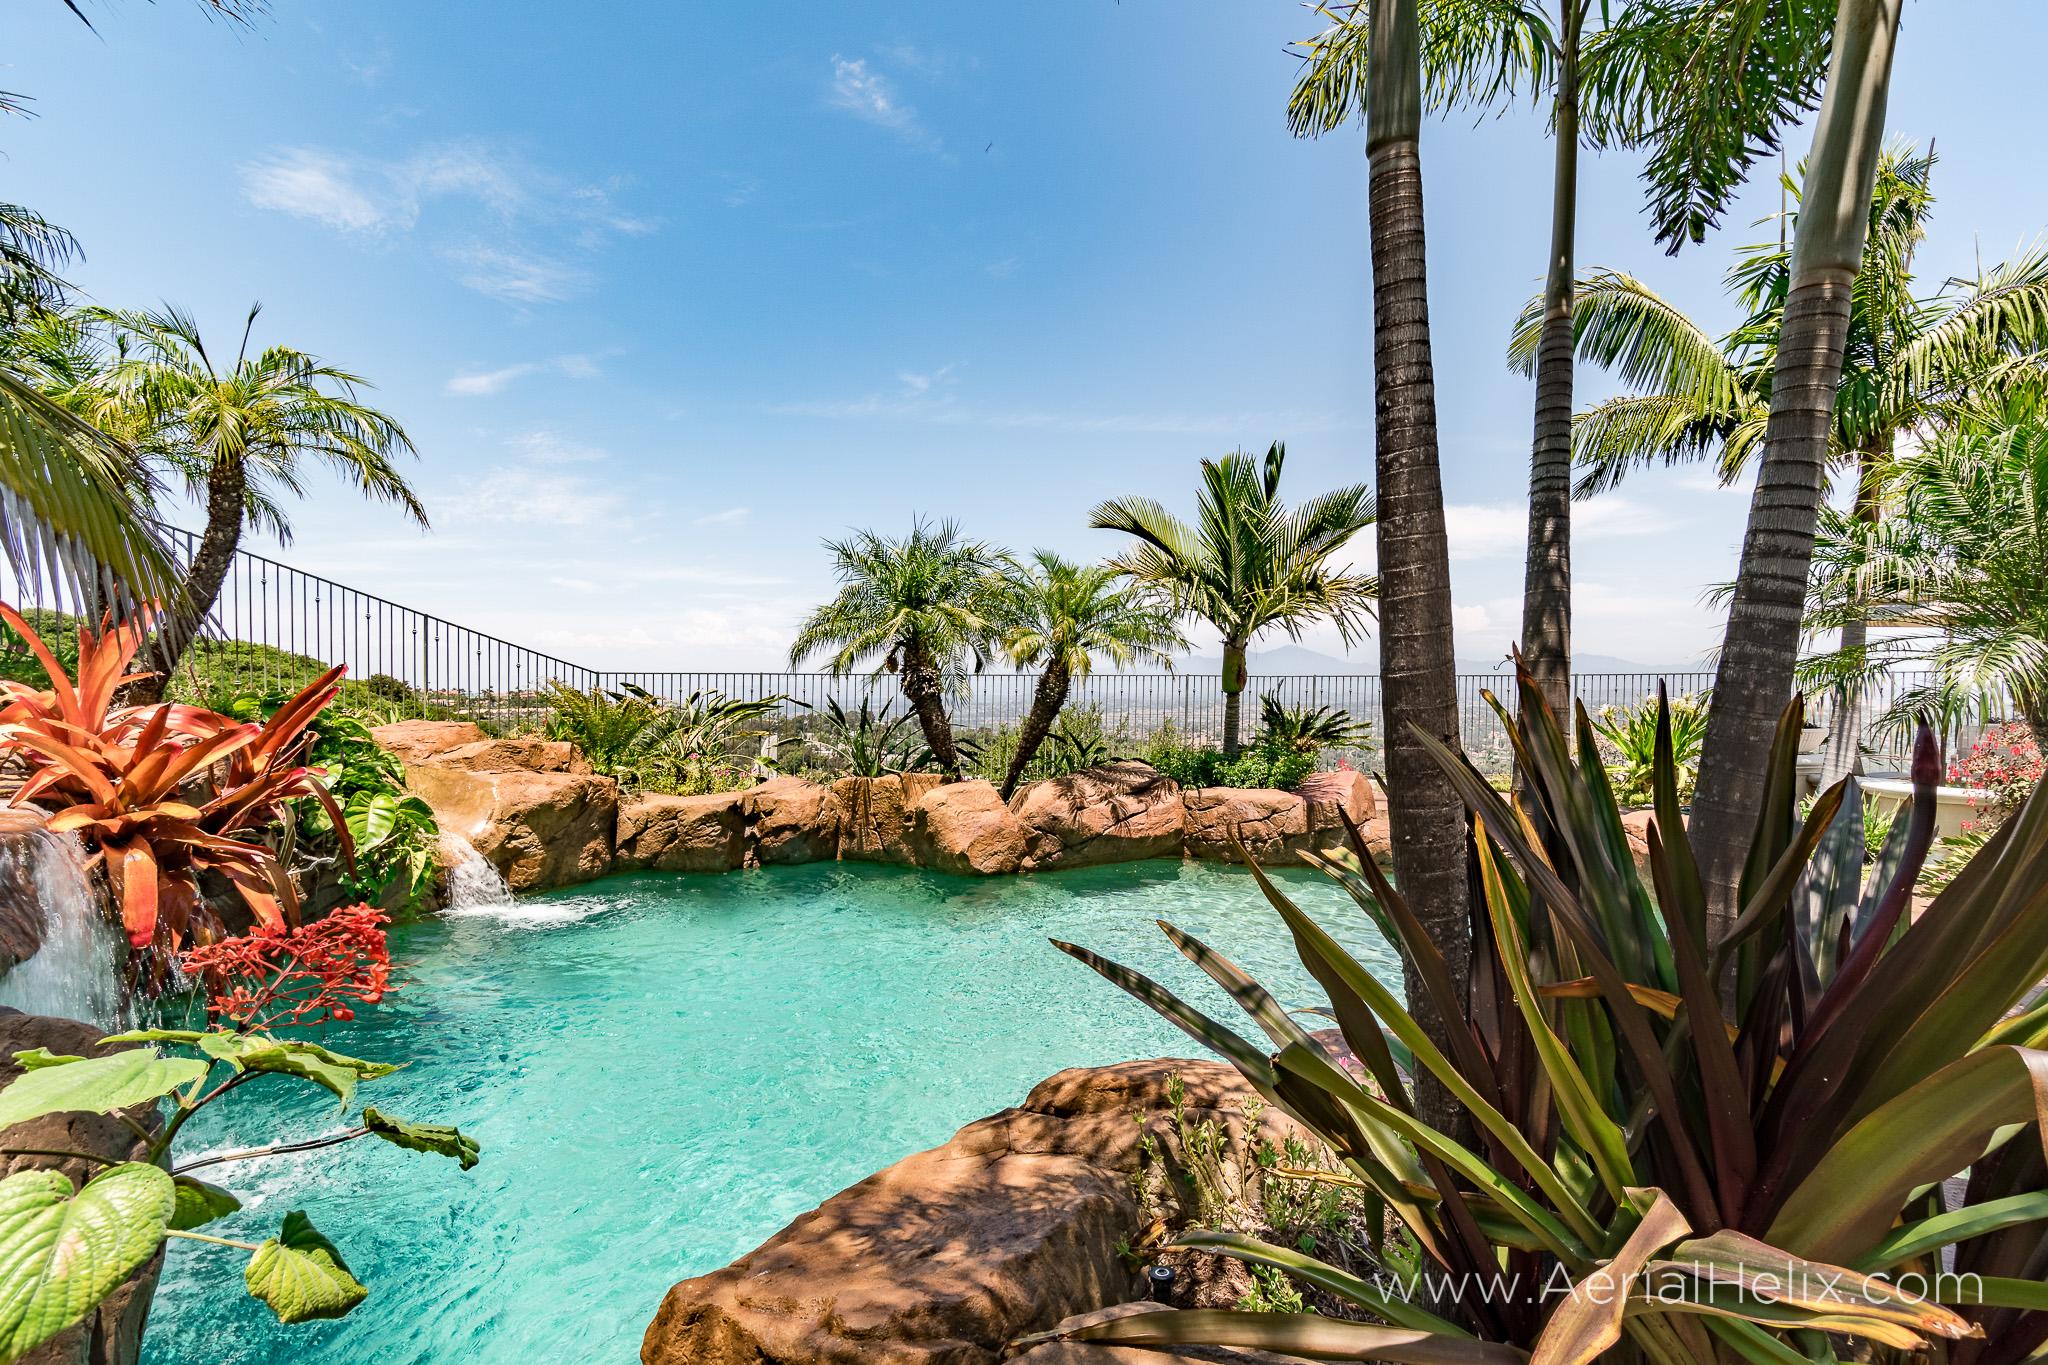 HELIX - Vista Montemar - real-estate-photographer-26.jpg